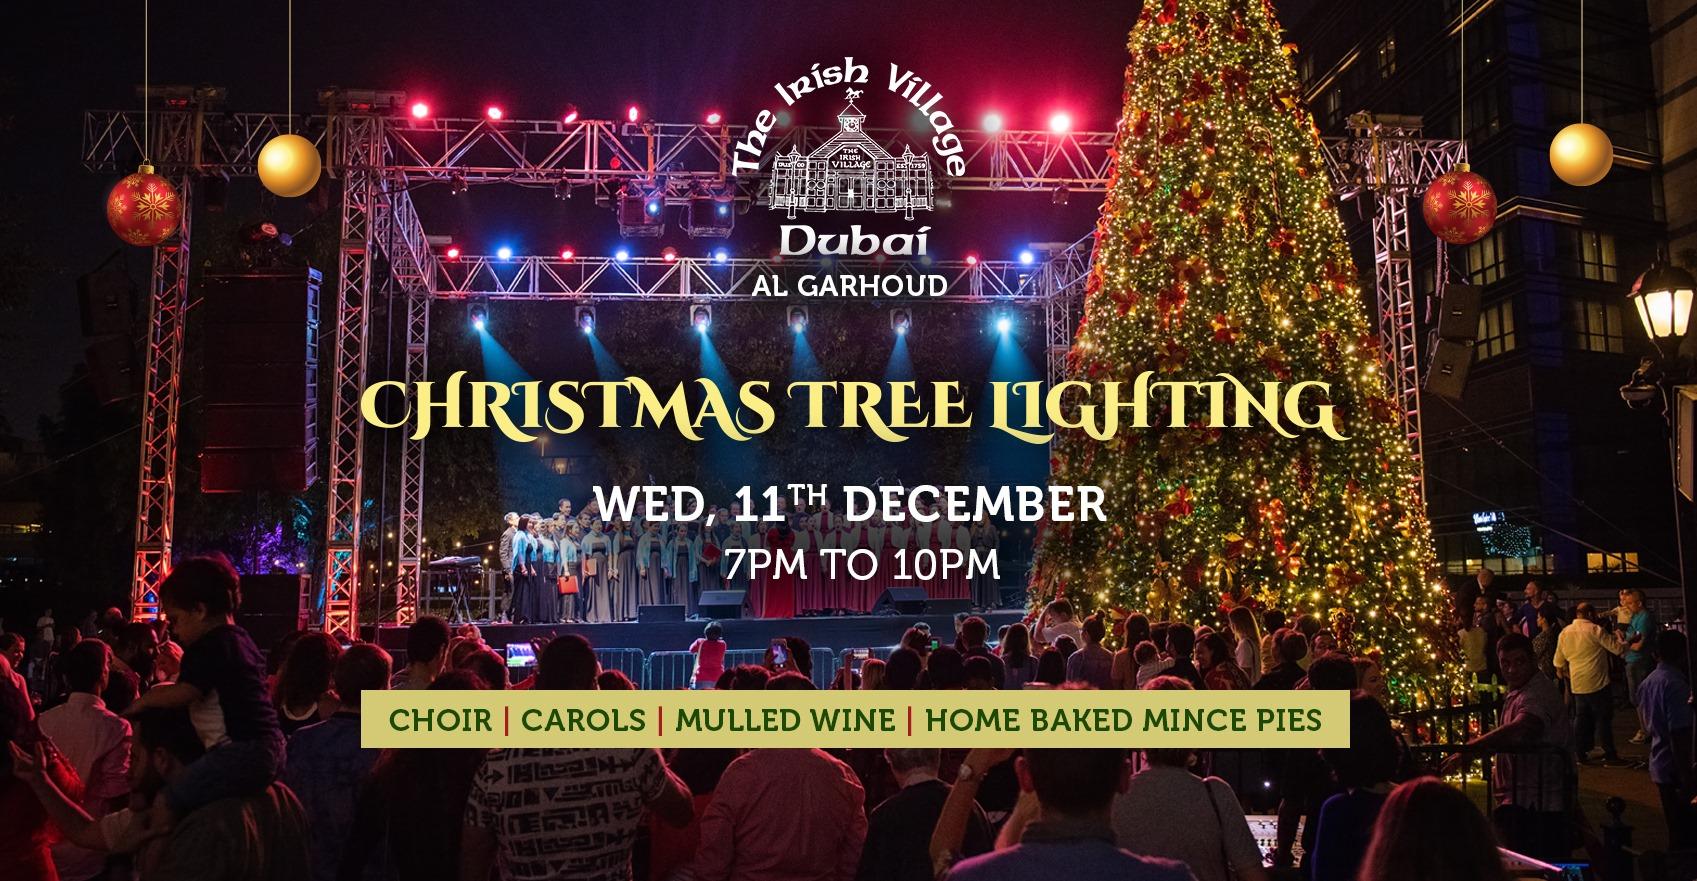 The Irish Village Garhoud Christmas Tree Lighting 2019 Promo Promolover